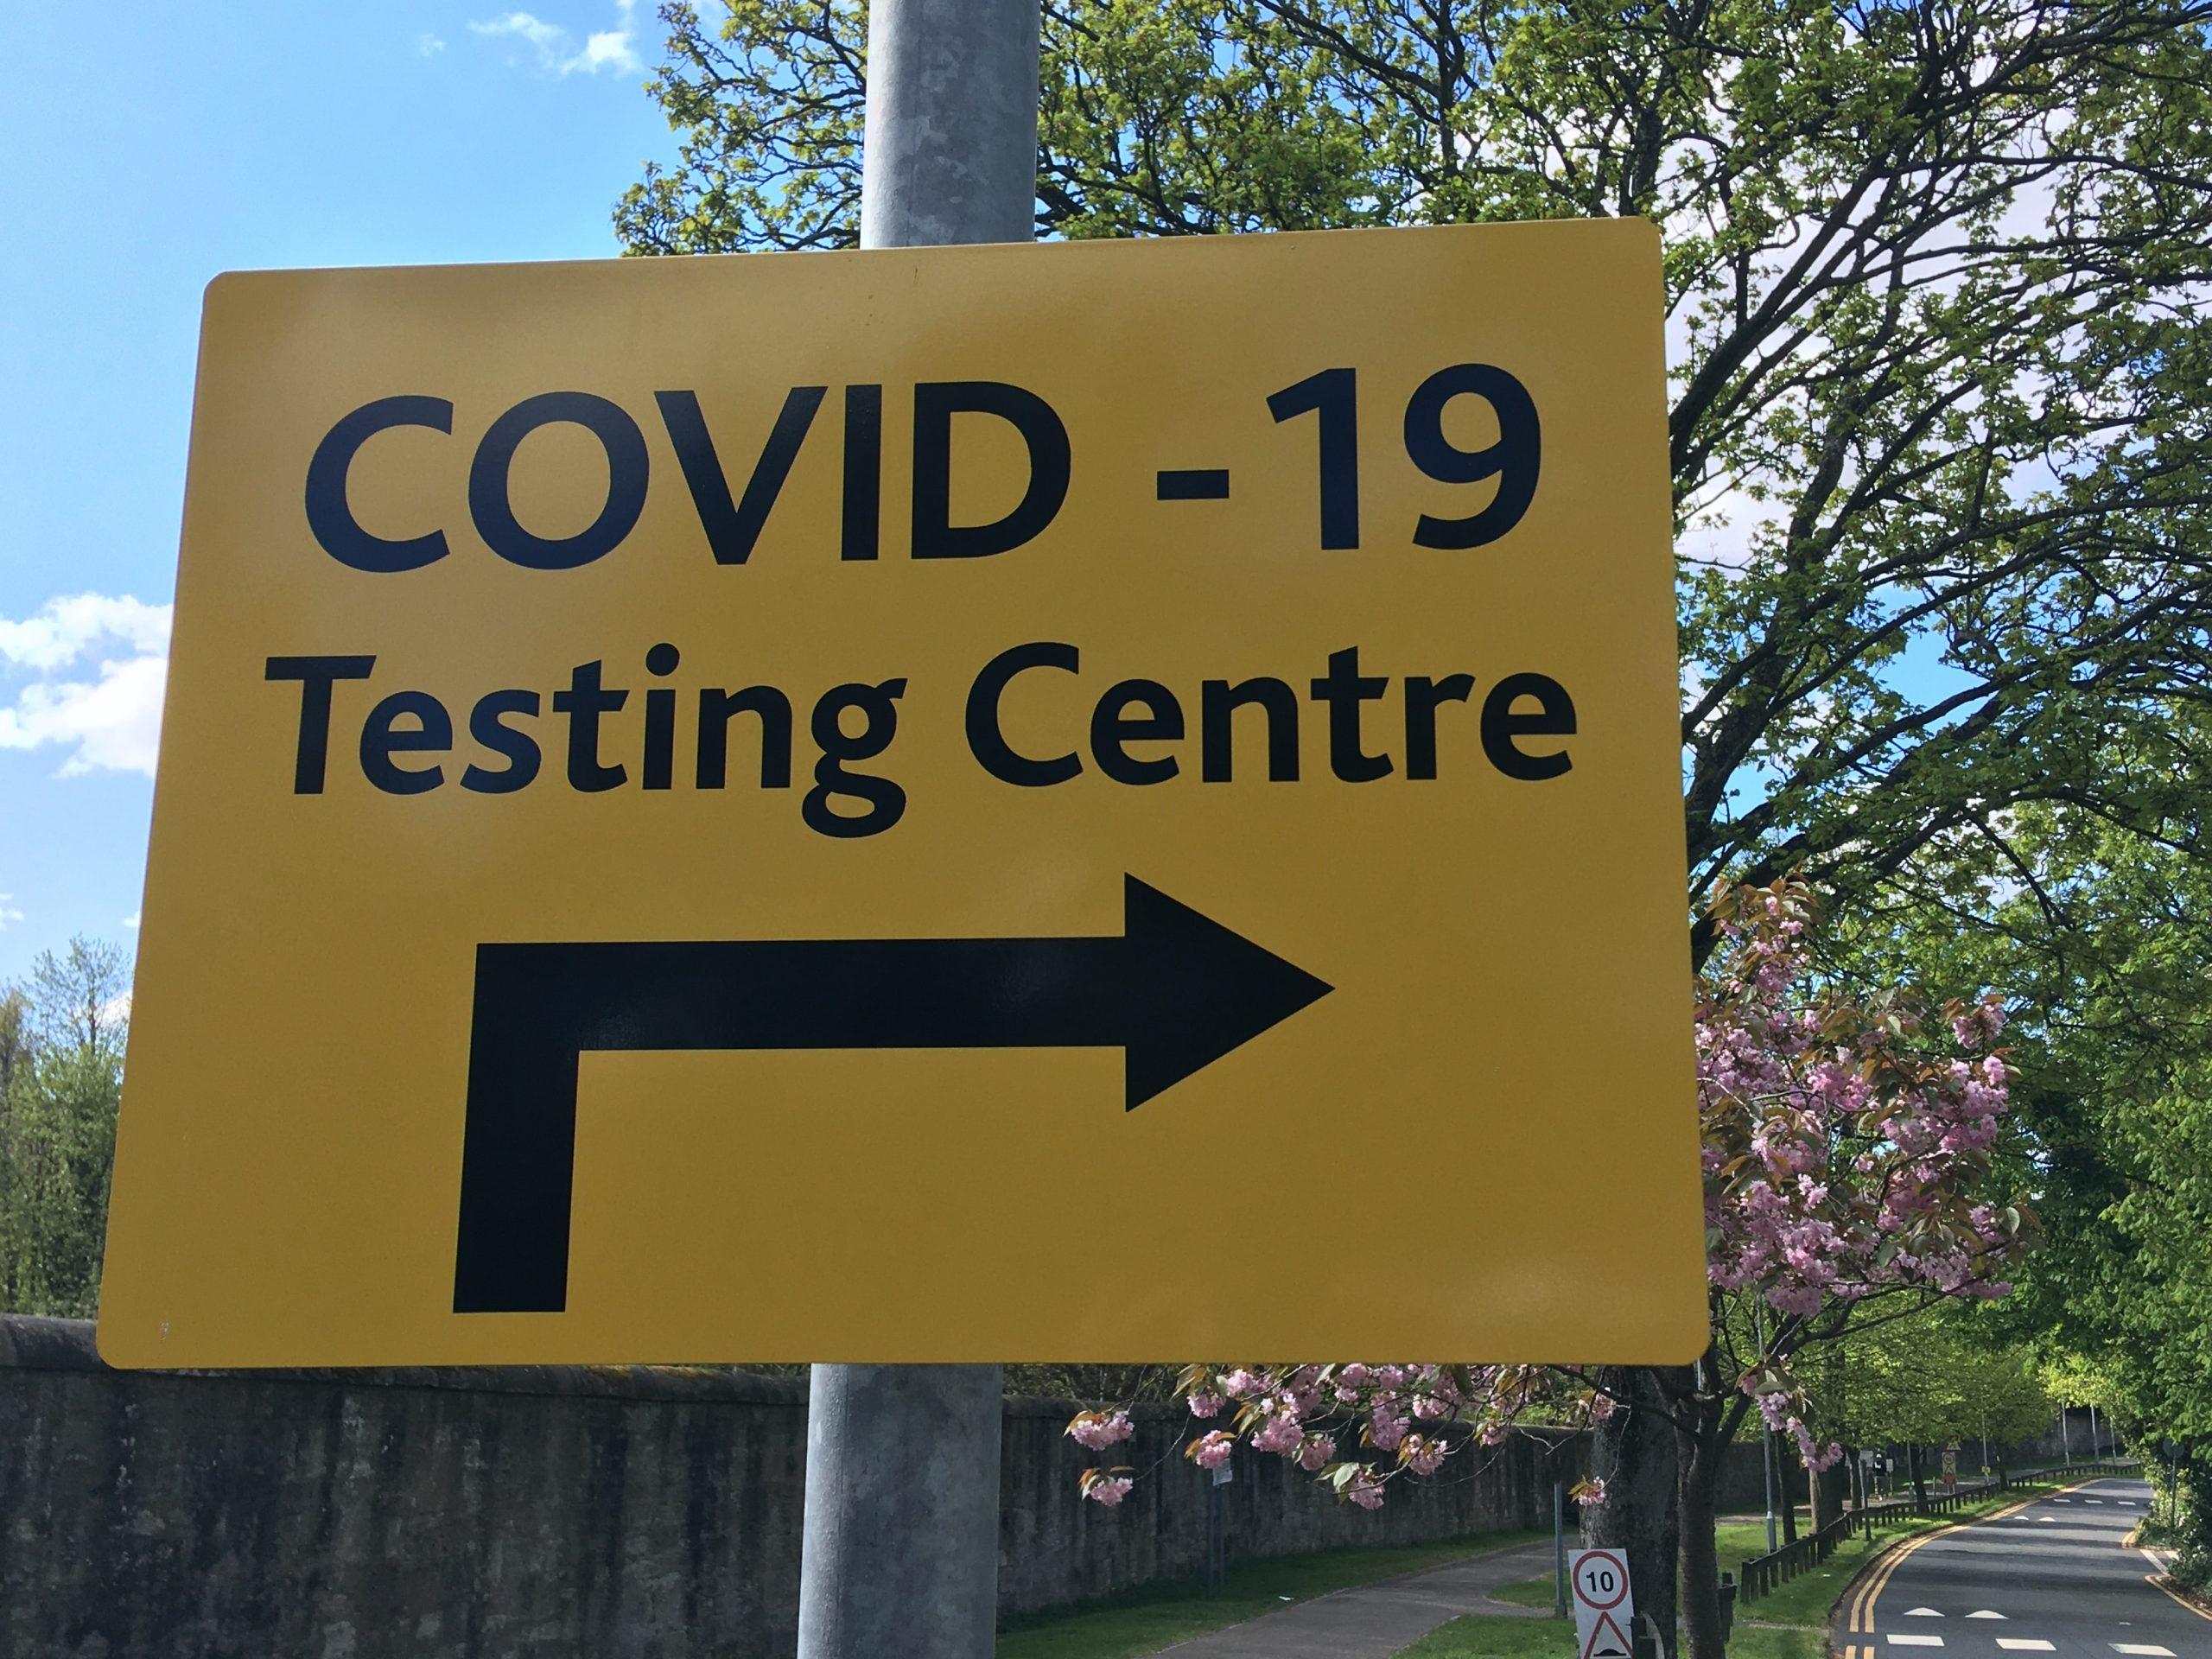 Pandemic Covid-19